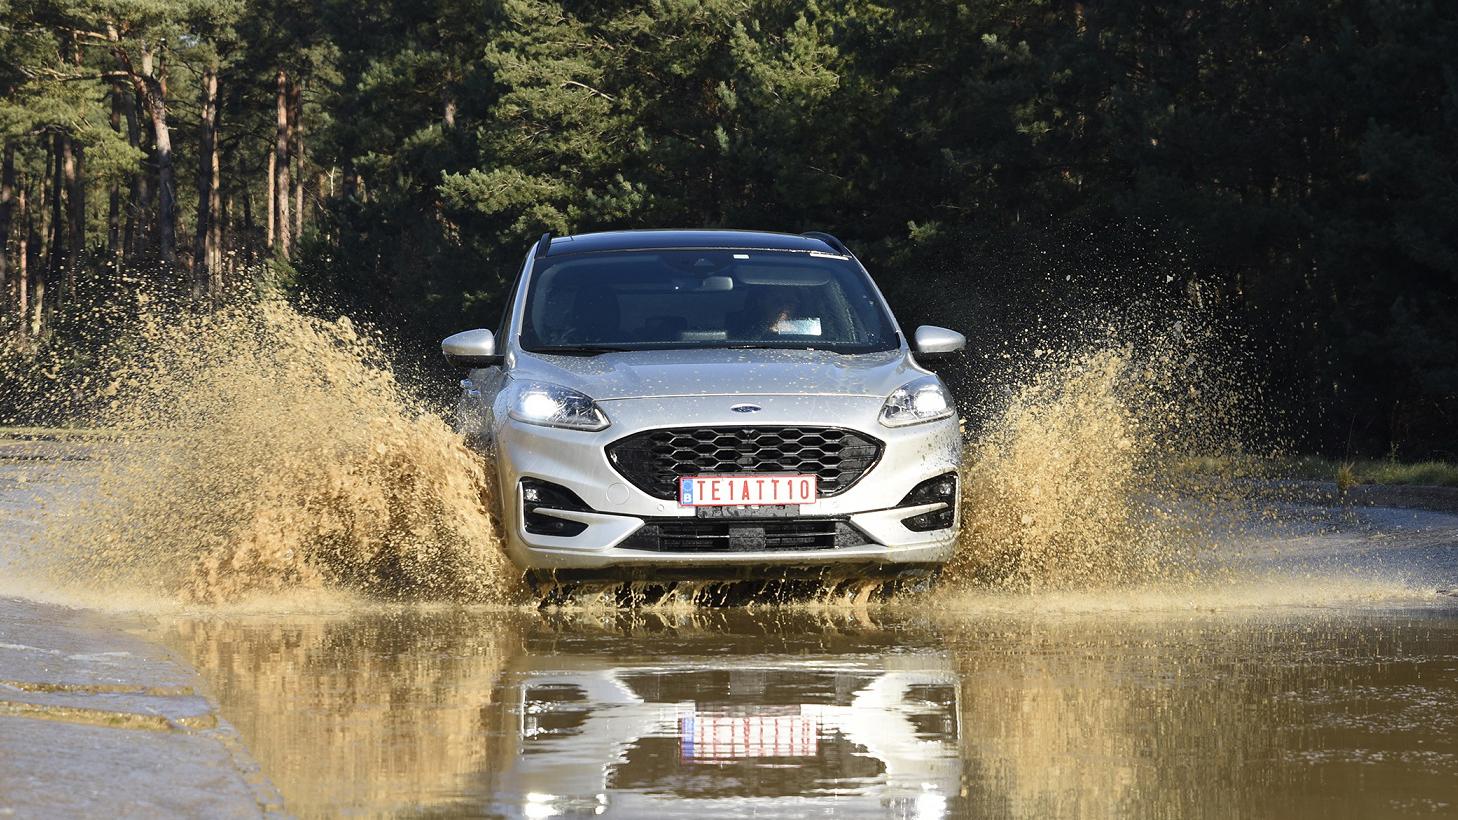 【影】來看全新國產 Ford Kuga 赴比利時受 Lommel 終極考驗!